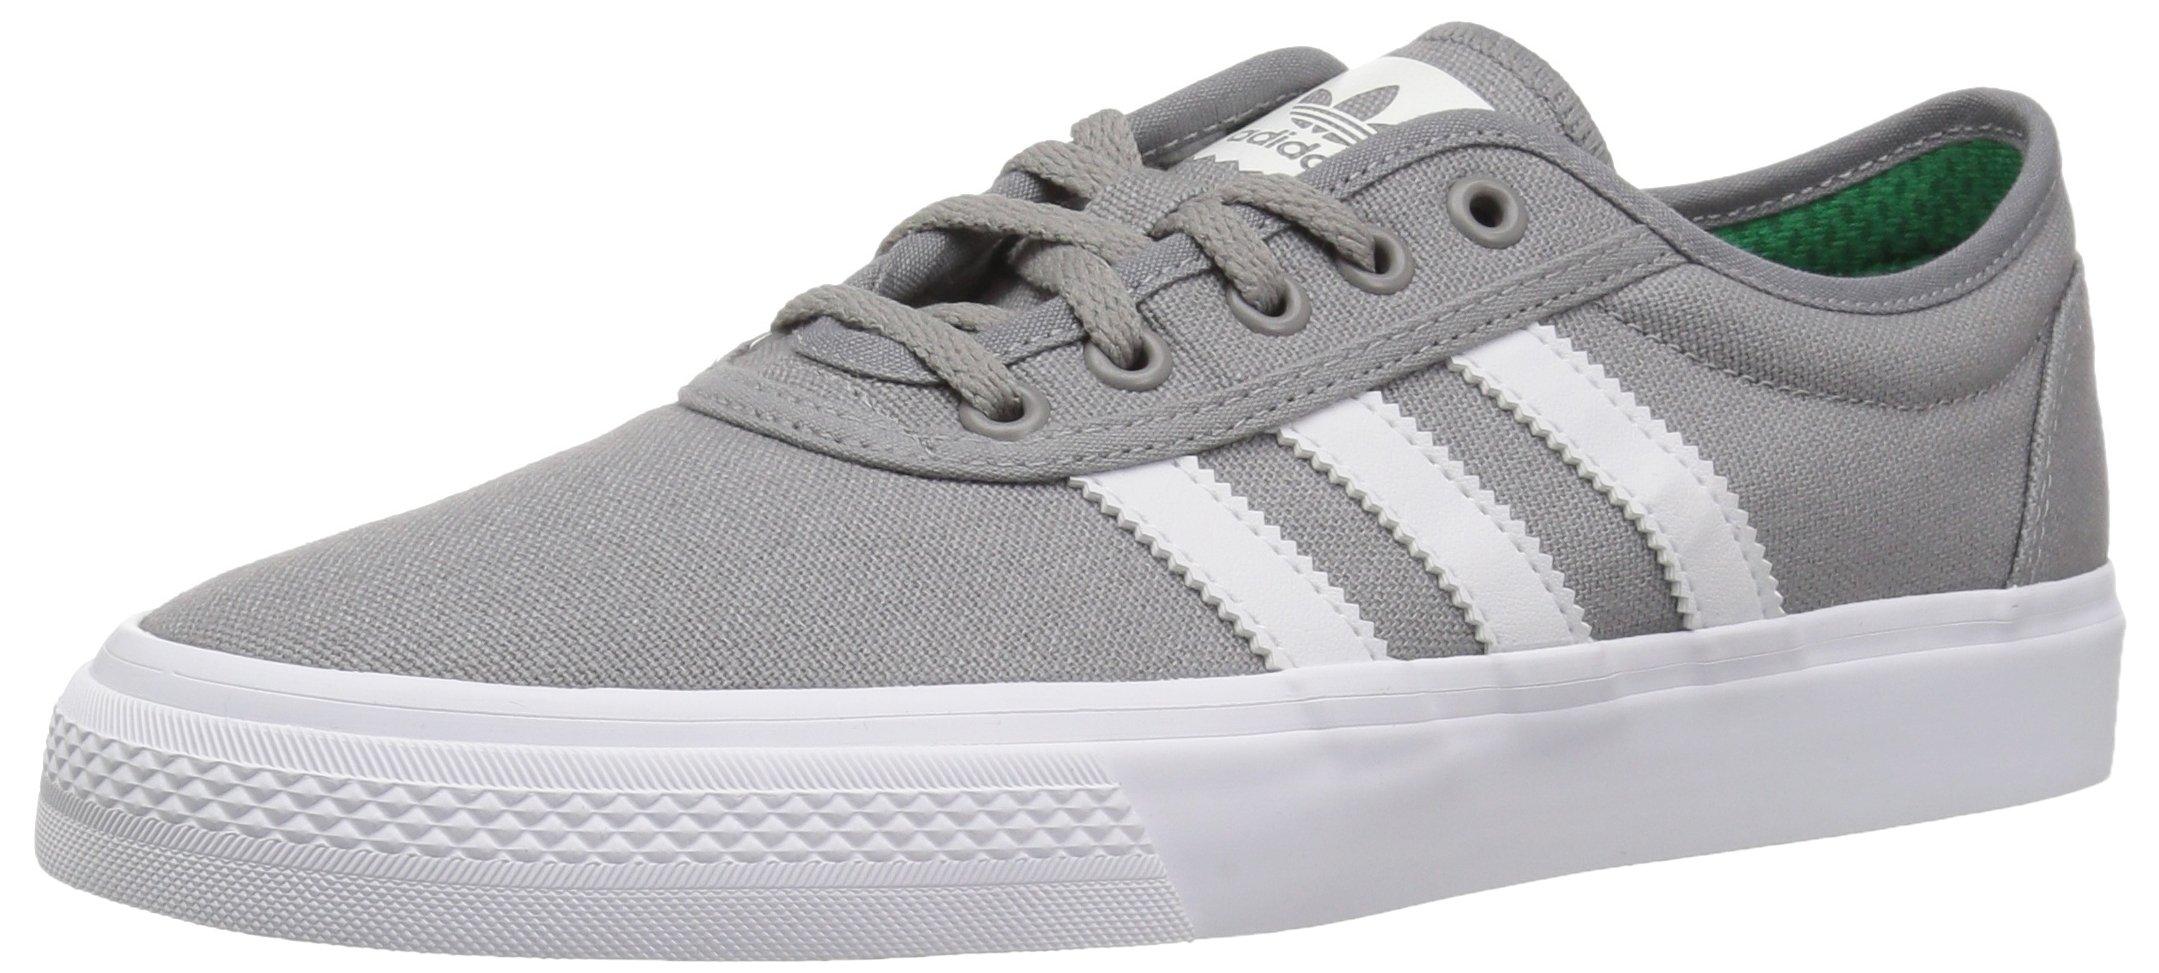 Adidas Originals Adi-Ease Skate Shoe